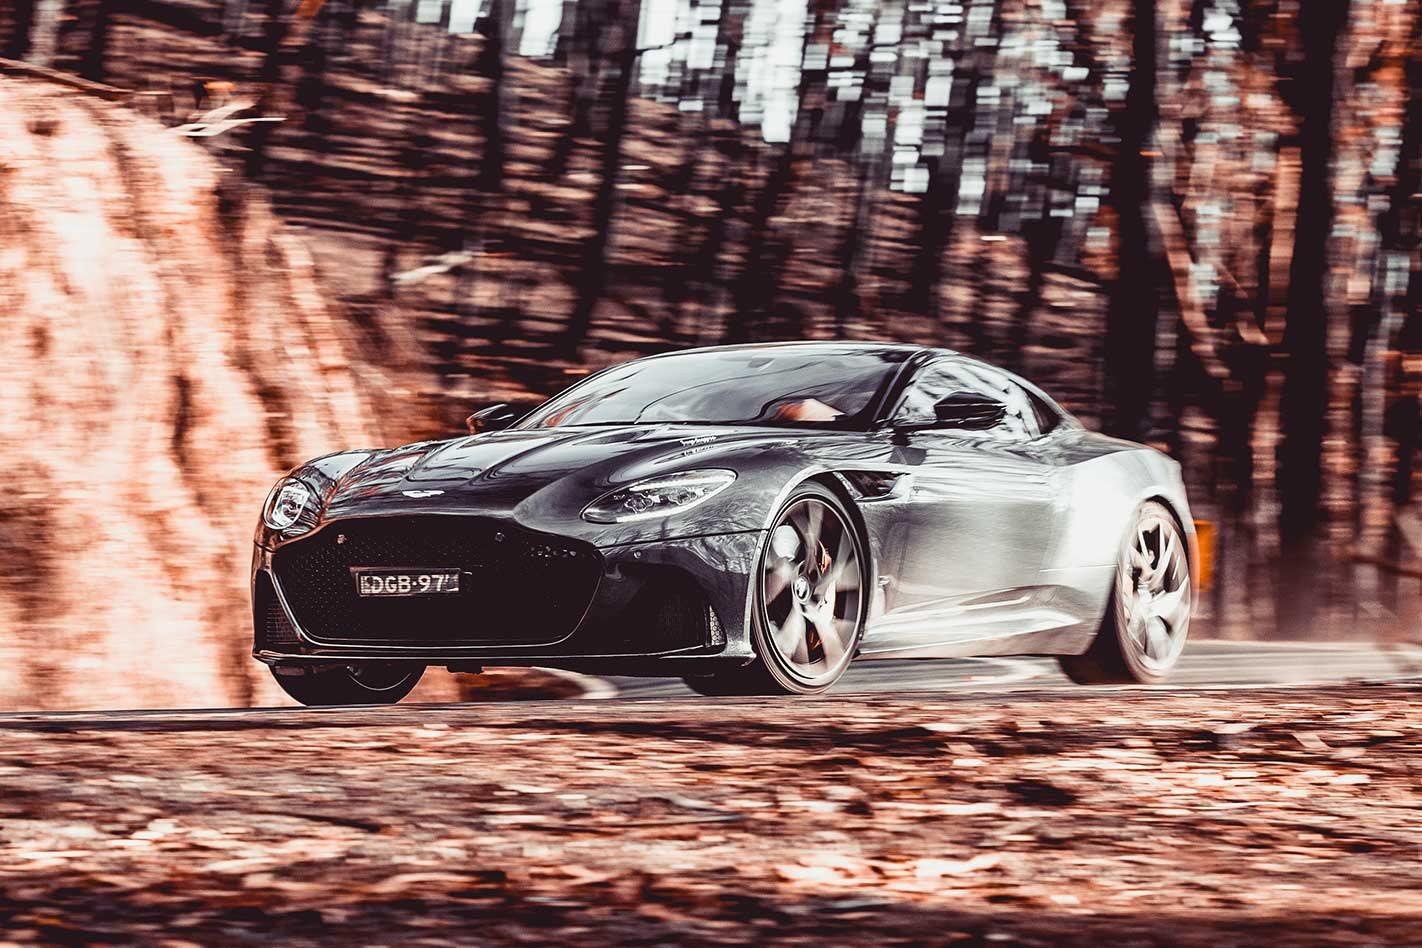 2019 Aston Martin DBS Superleggera | MOTOR feature review